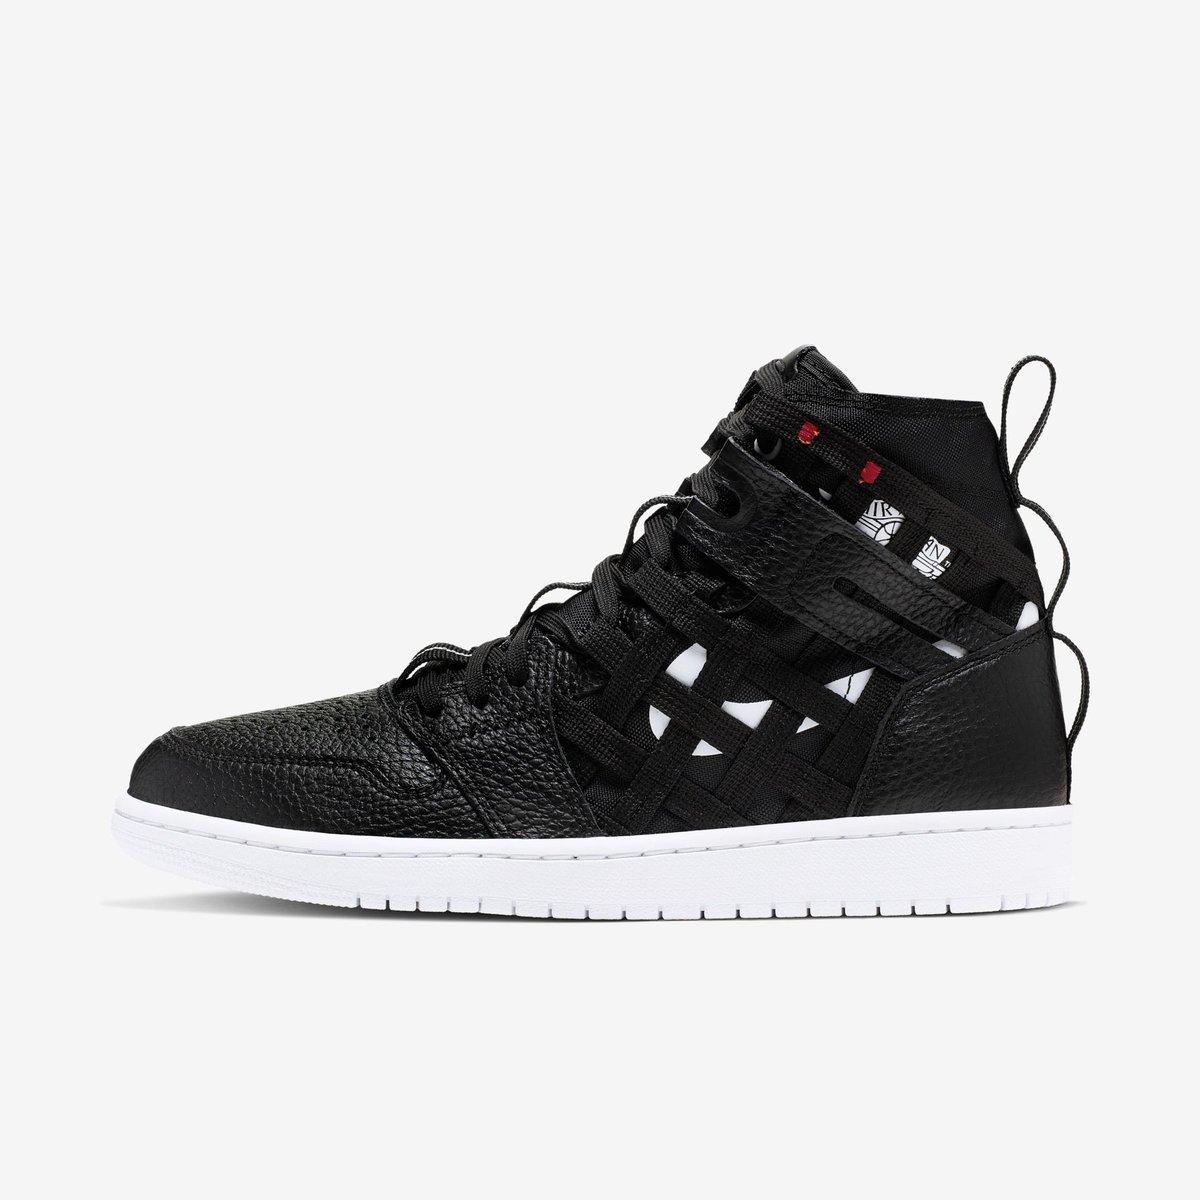 "5694f155f09357 Jordan 1 Cargo ""Black"" available now direct on  nikestore Link -   https   go.j23app.com bzz pic.twitter.com 8ukriU1B5i"